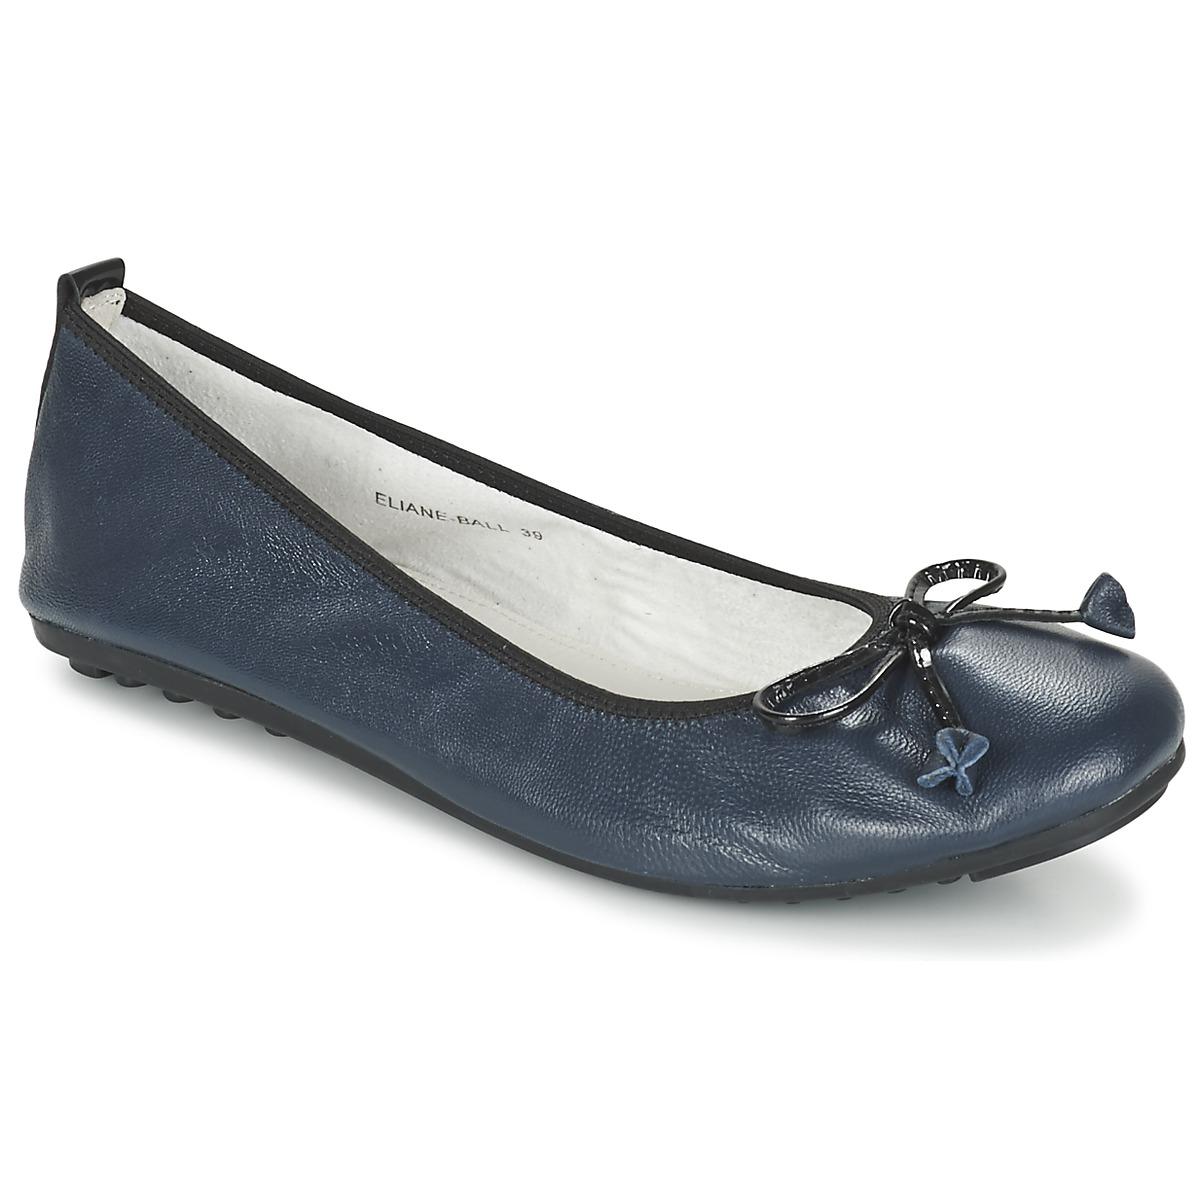 cc0519d158a Chaussures Femme Ballerines   babies Mac Douglas ELIANE Marine